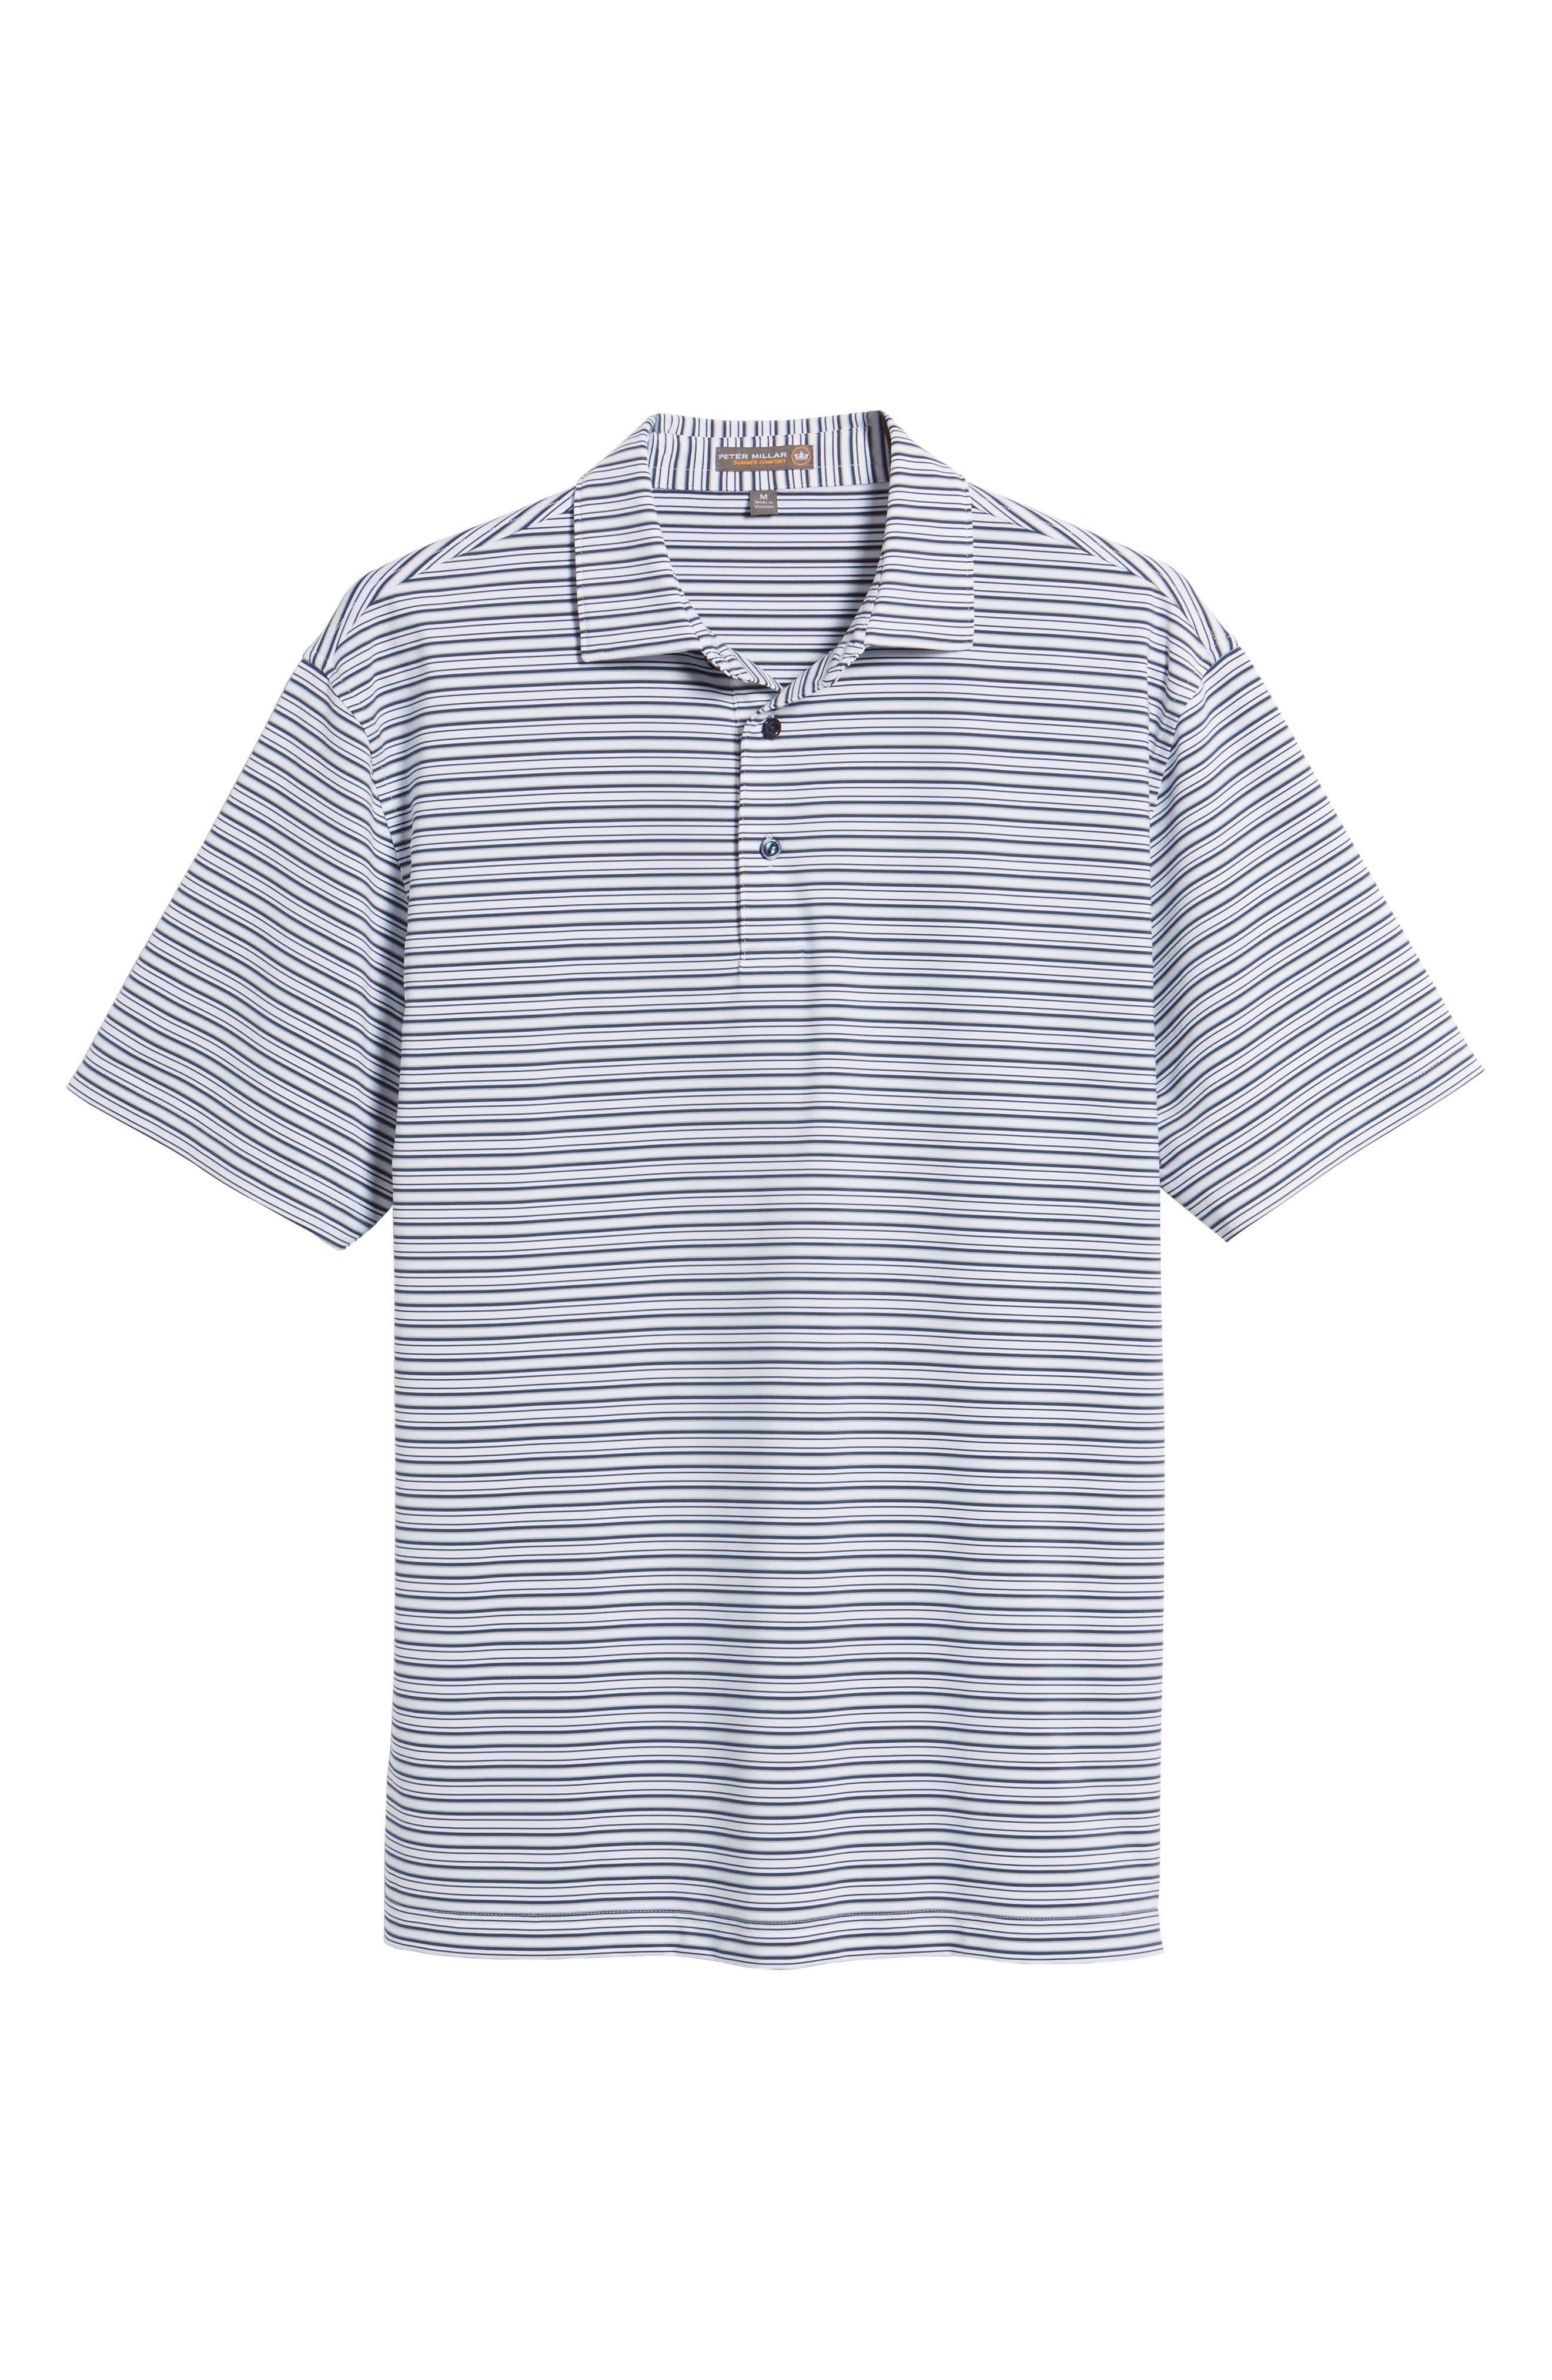 Barron Sean Stripe Jersey Polo,                             Alternate thumbnail 6, color,                             100